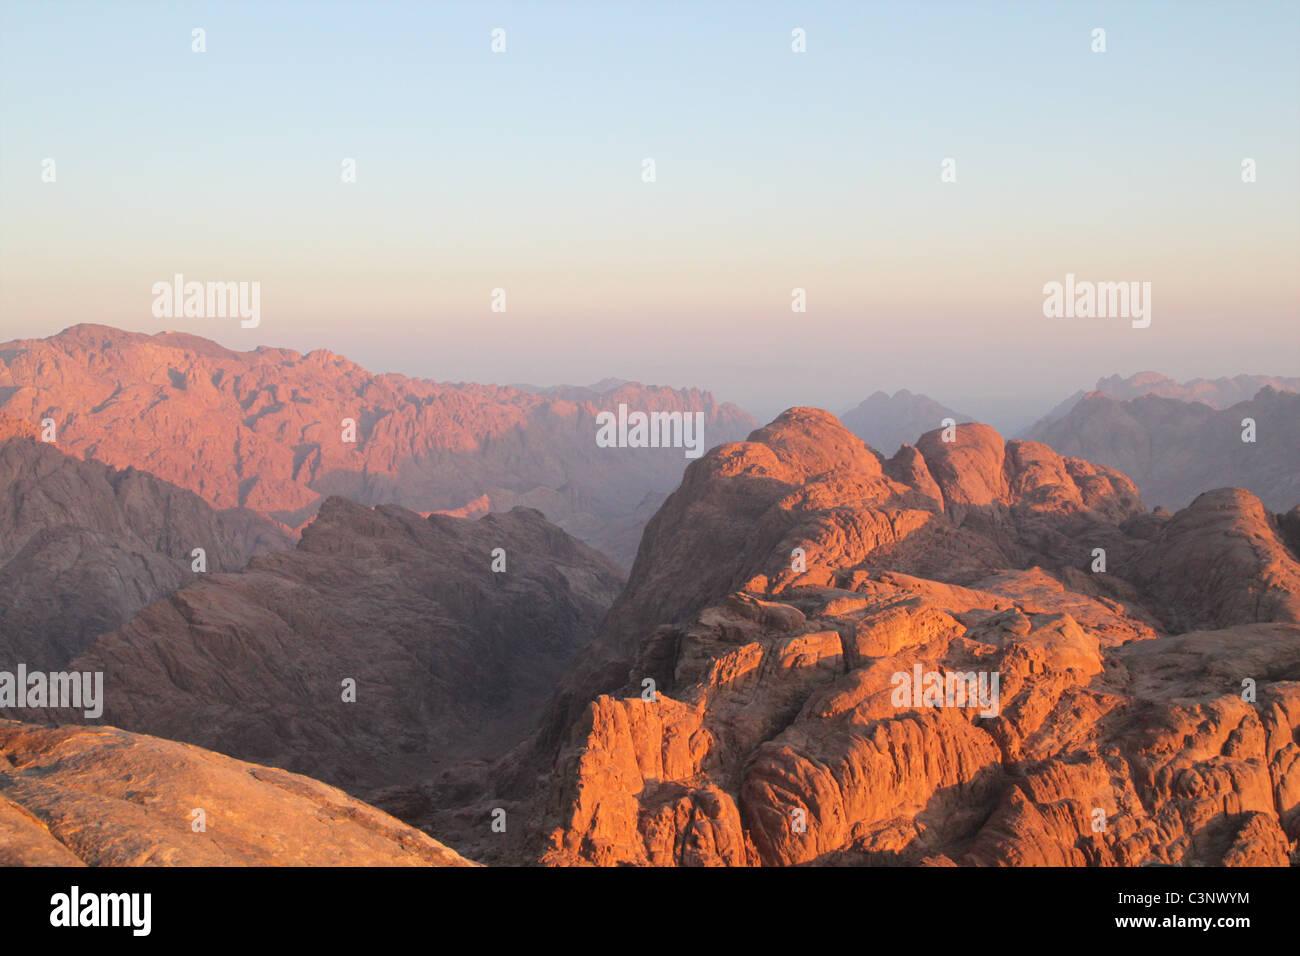 Sunset on Mount Sinai (Jebel Musa), Egypt. - Stock Image